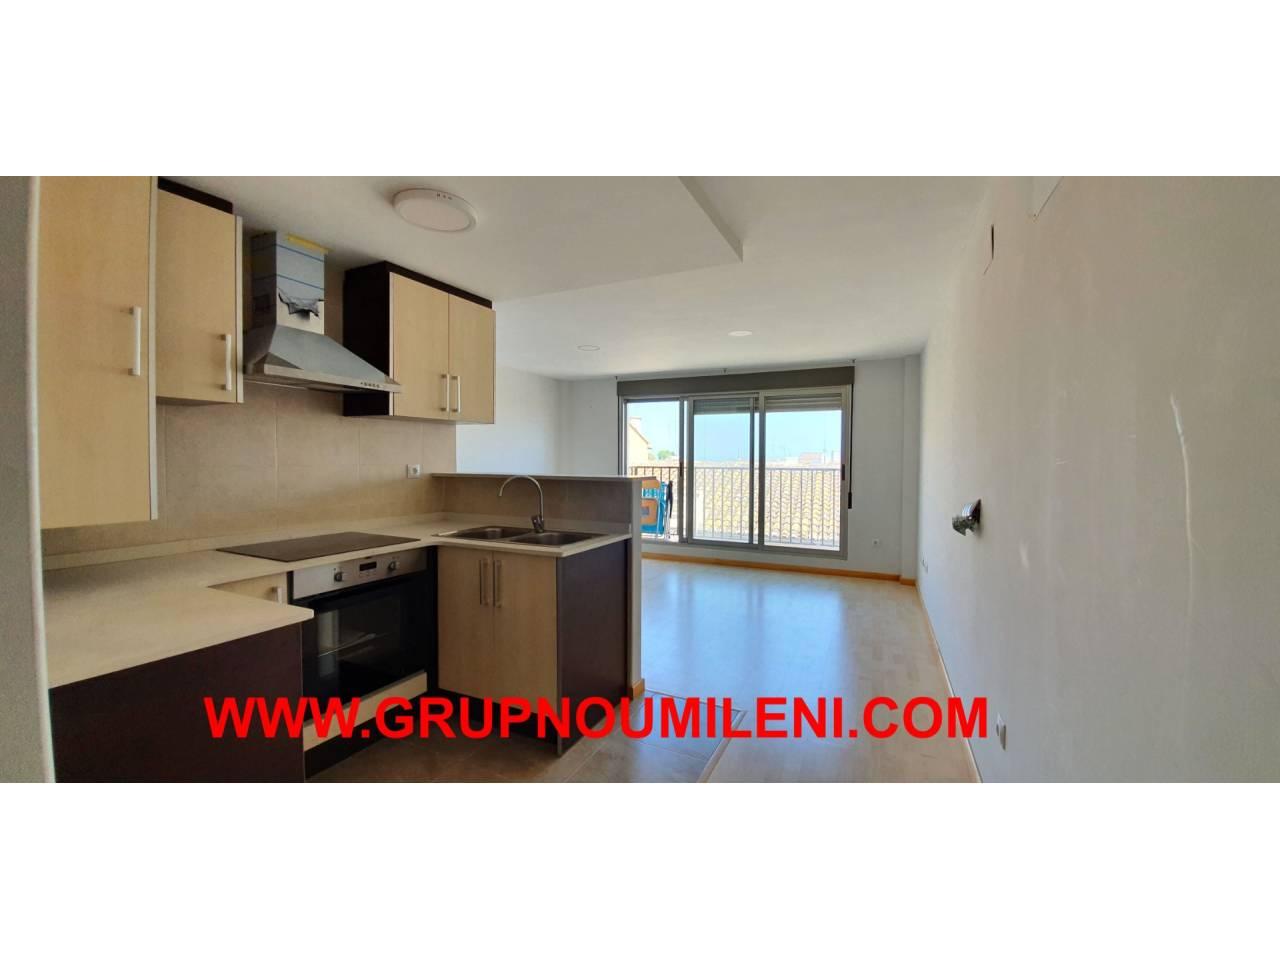 Location Appartement  Picassent. Altura piso 2º, piso superficie total 66 m², superficie solar 70